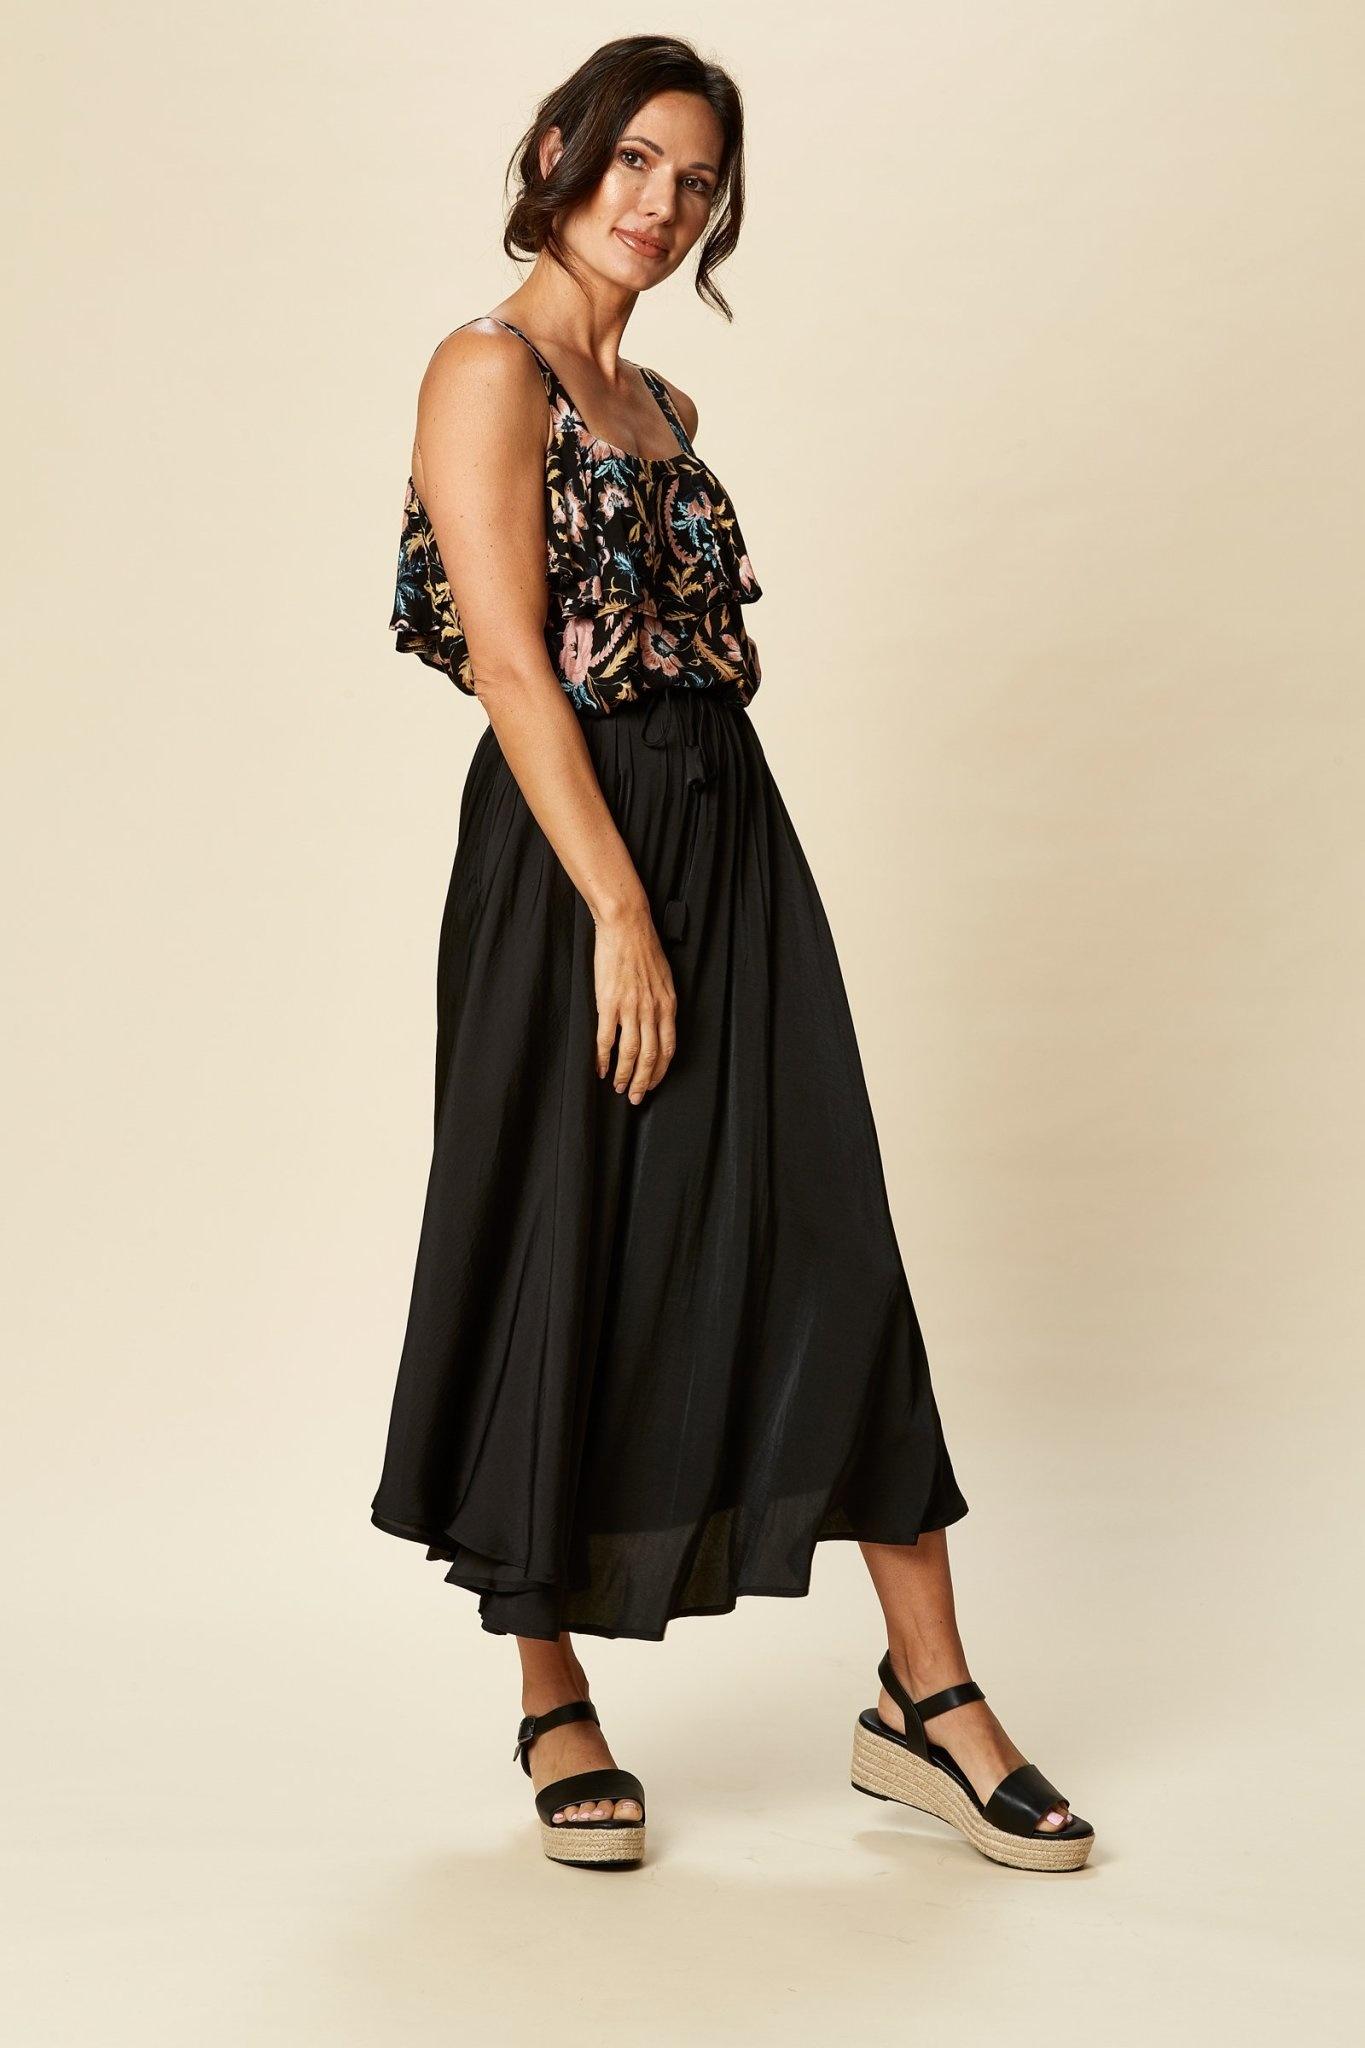 Eb & Ive Zena Skirt